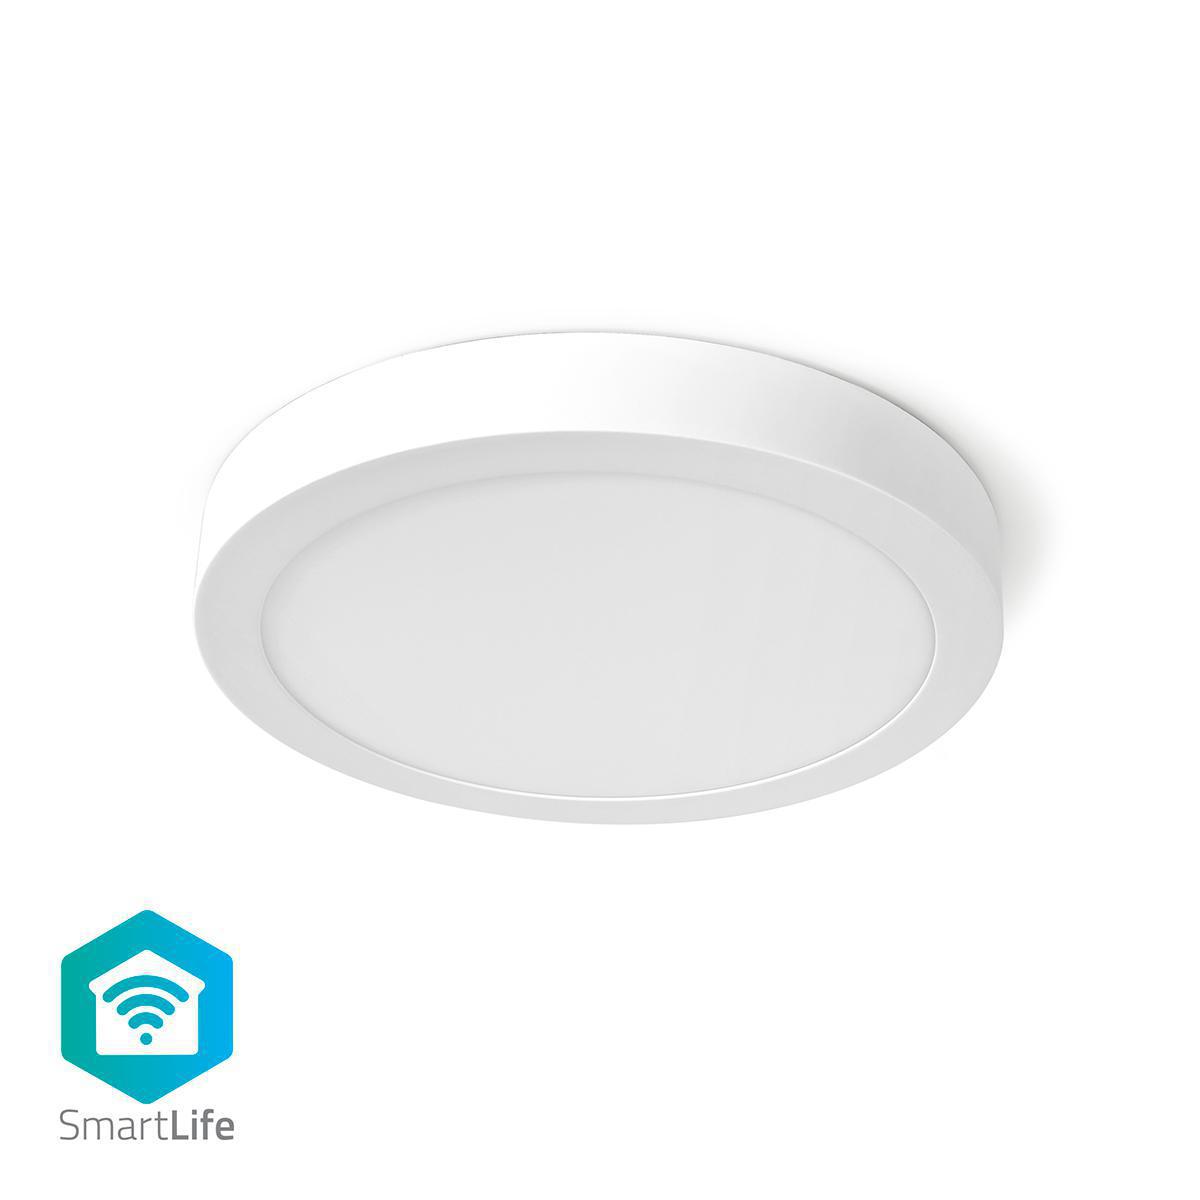 WiFi - Smart LED plafondlamp - 18 watt - 30cm - warm tot koel wit - 18 watt - dimbaar - app besturing - onderkant